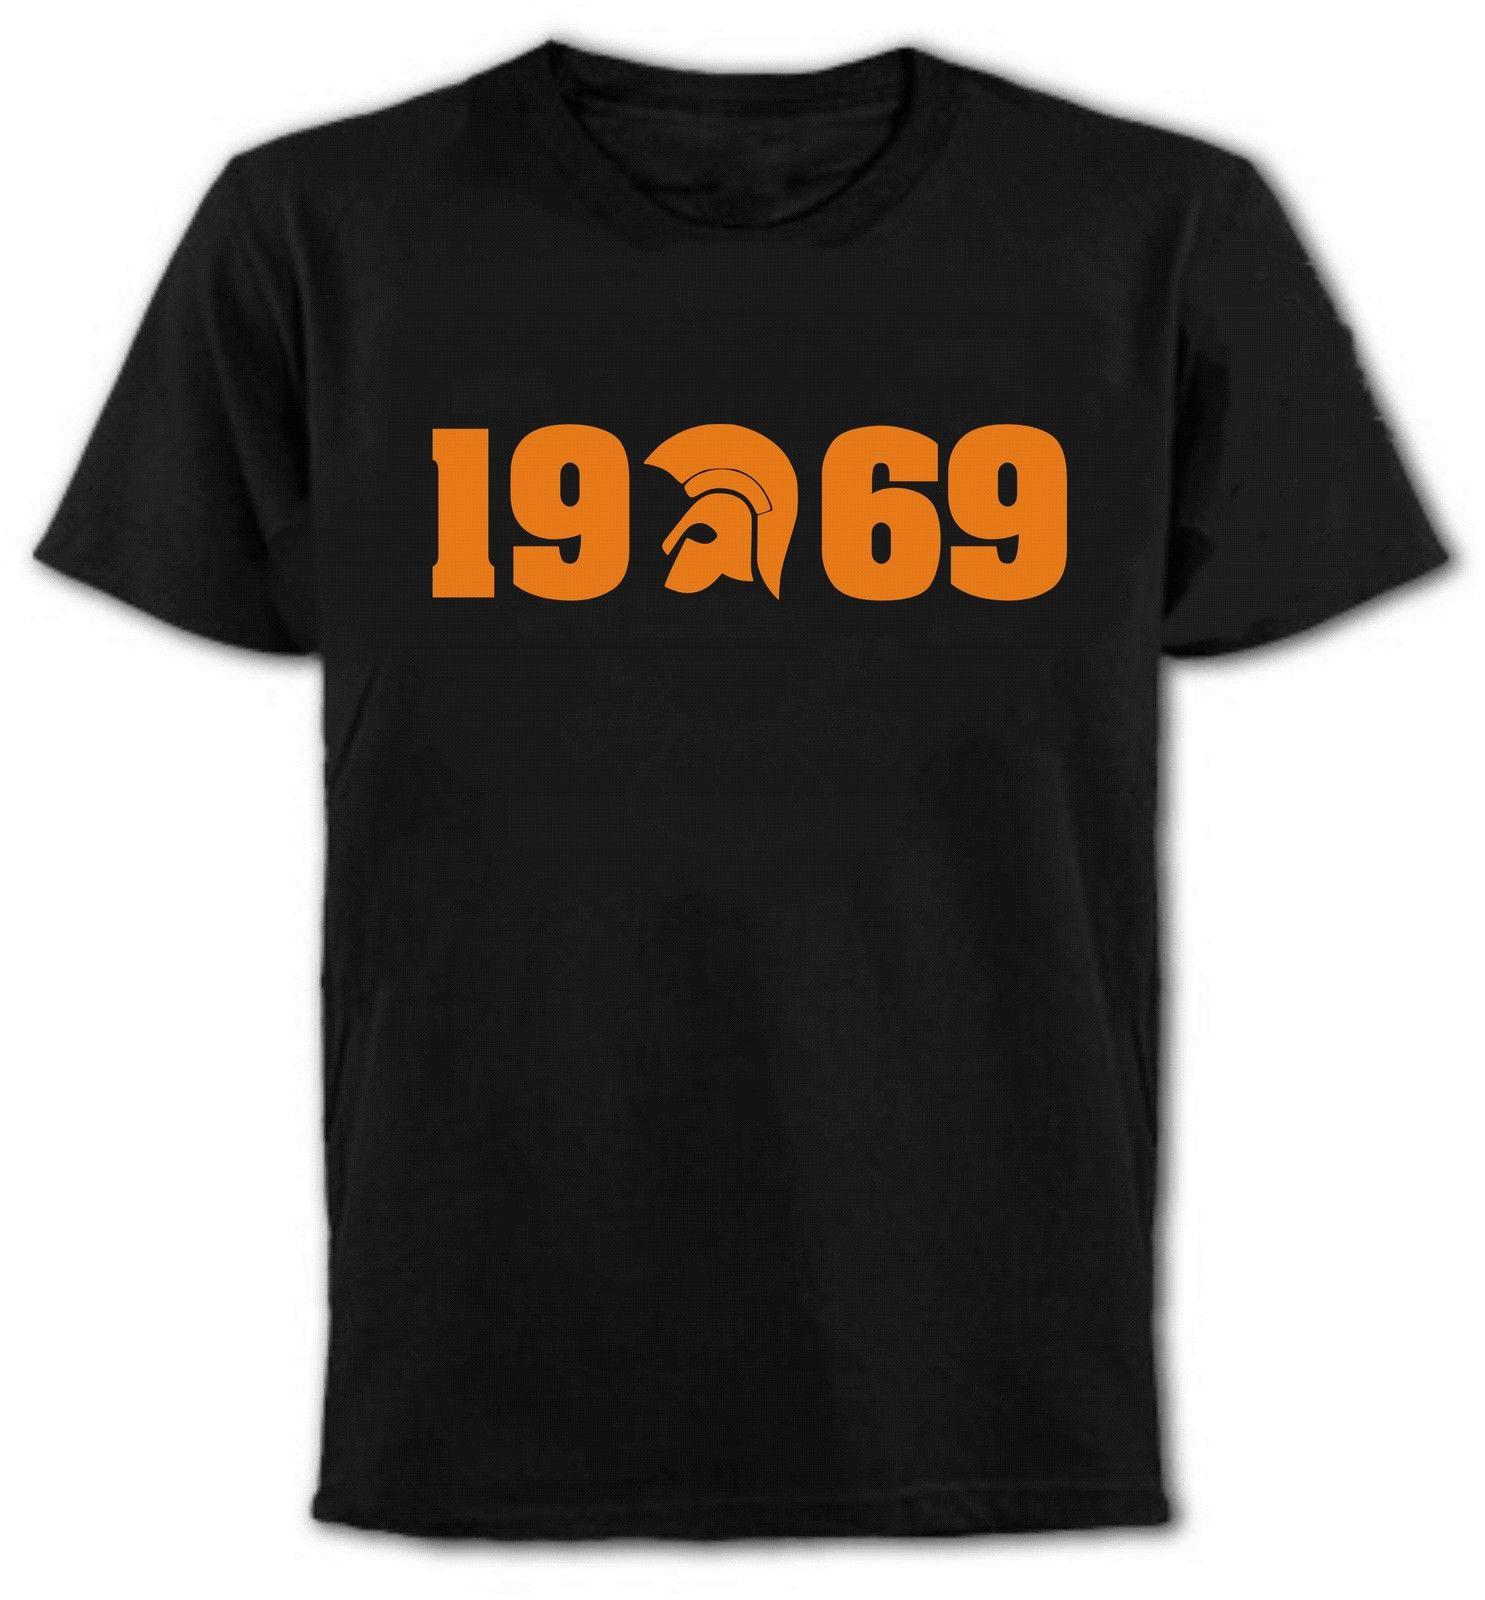 Design t shirt reggae - T Shirt 2017 Newest Men S 1969 Reggae Ska Skinhead Mod Rude Boy O Neck Short Design T Shirts